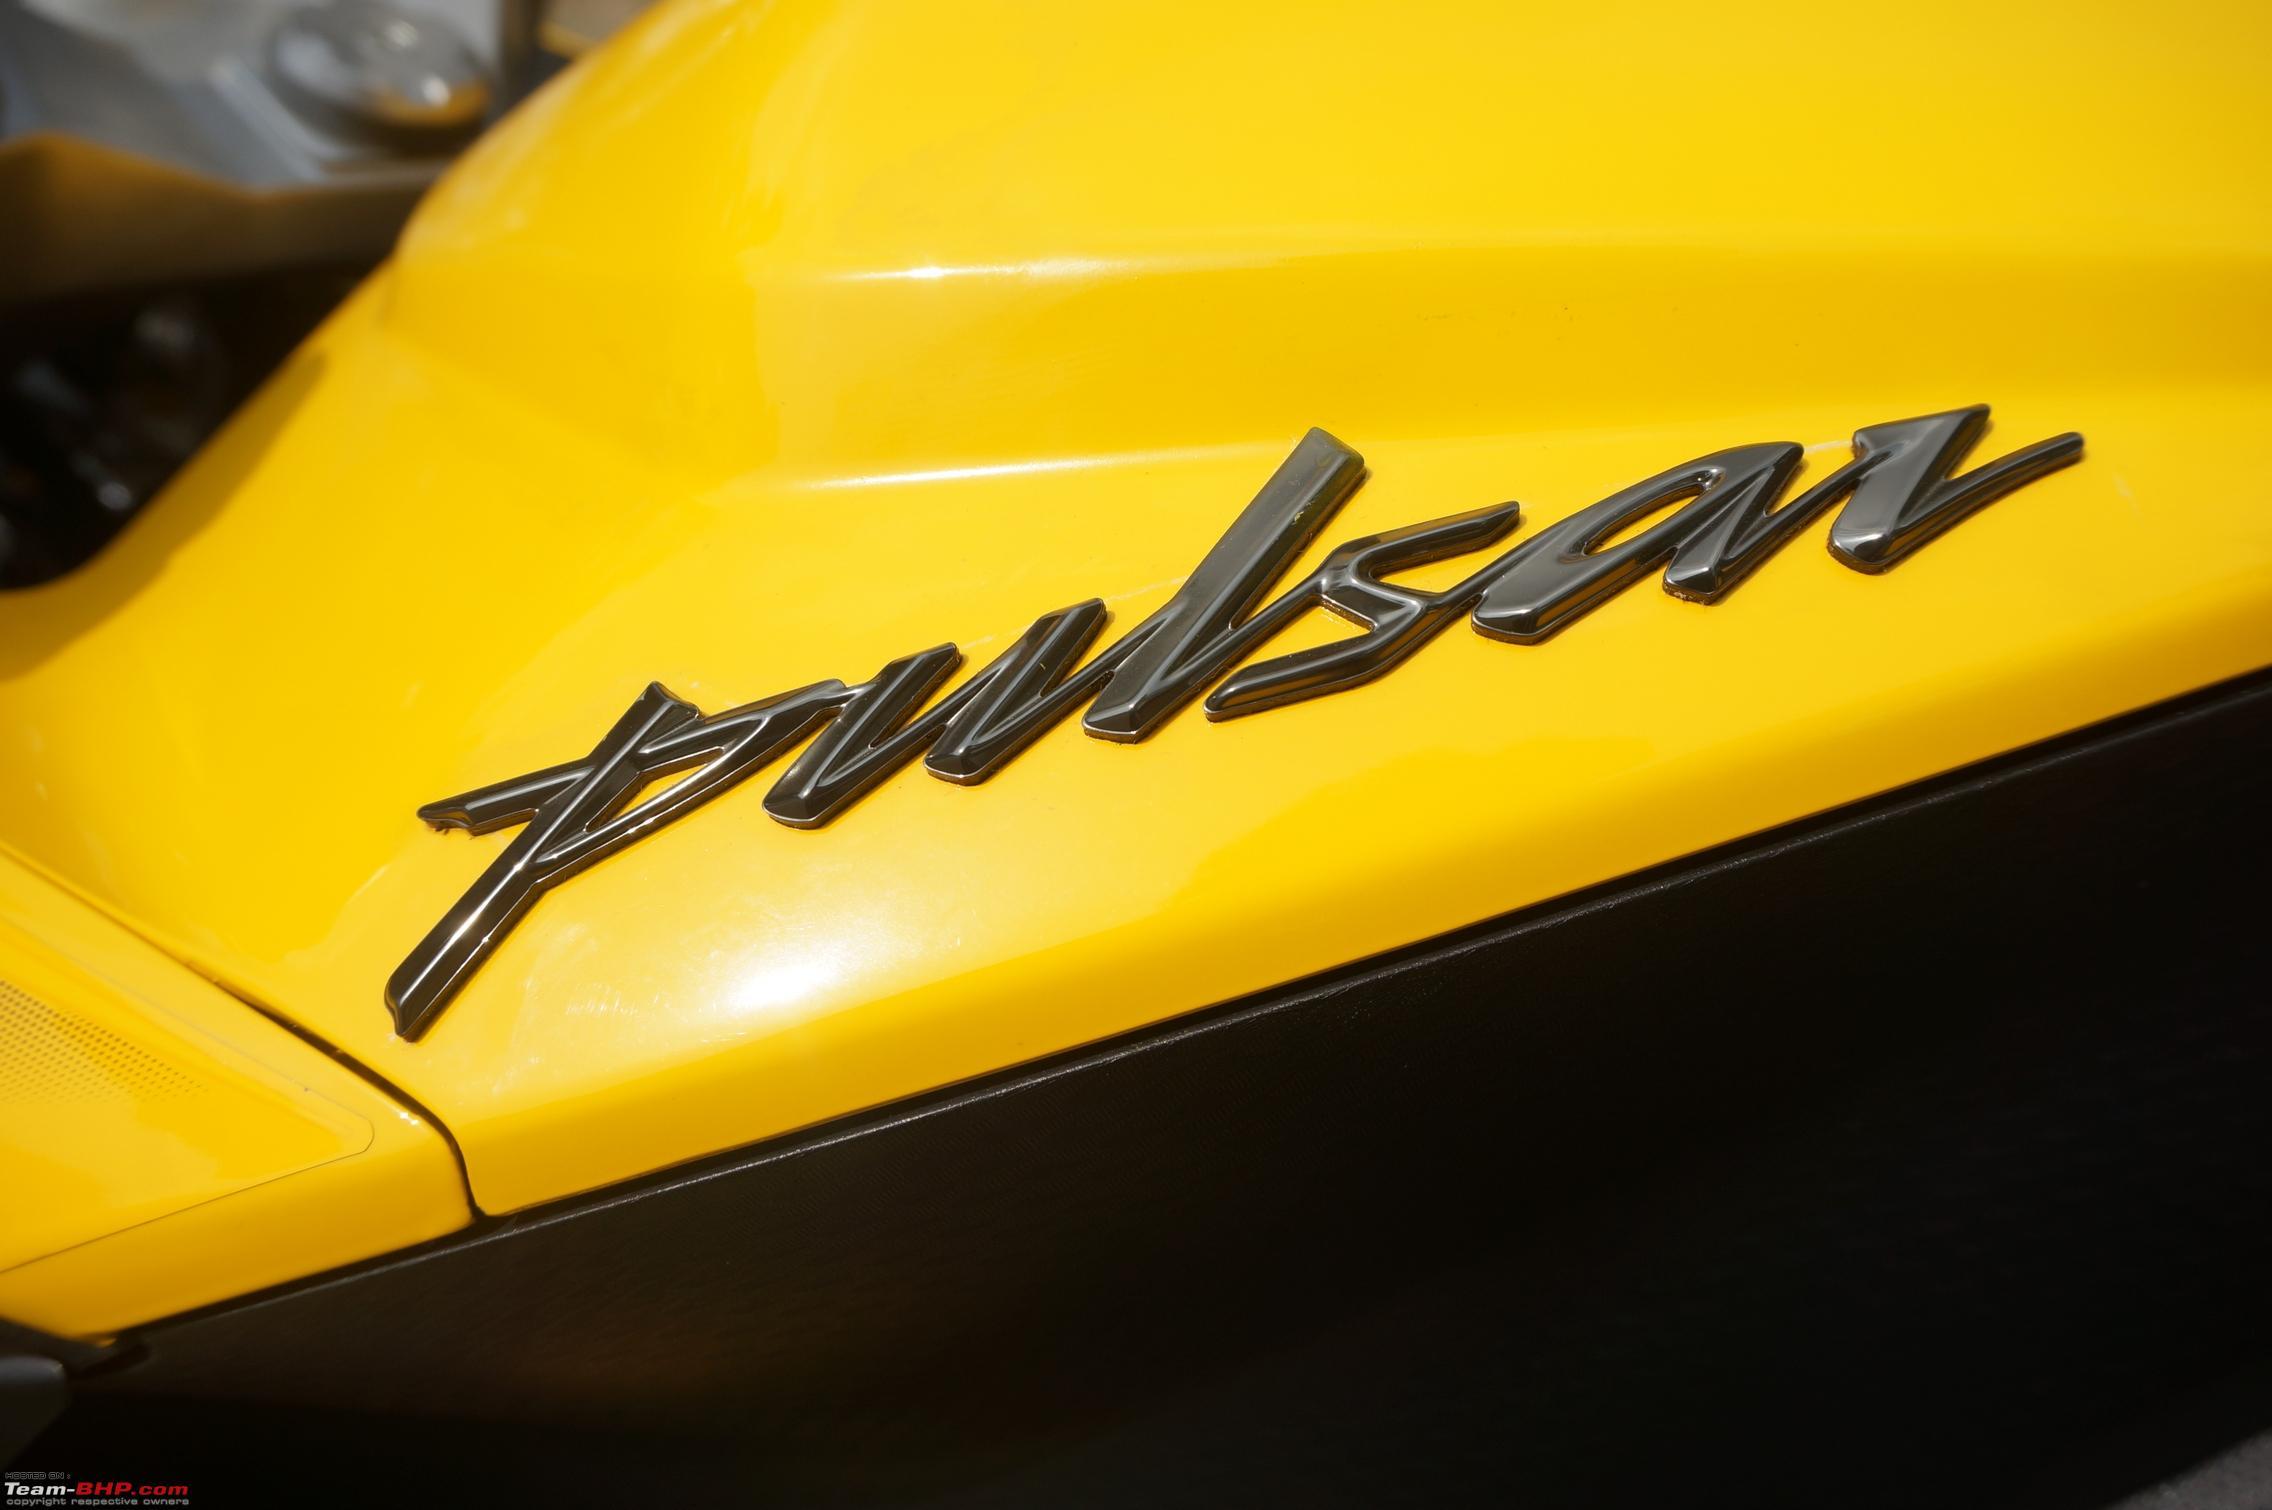 Report, Pics & Video: Bajaj Pulsar RS200 ridden at the factory test